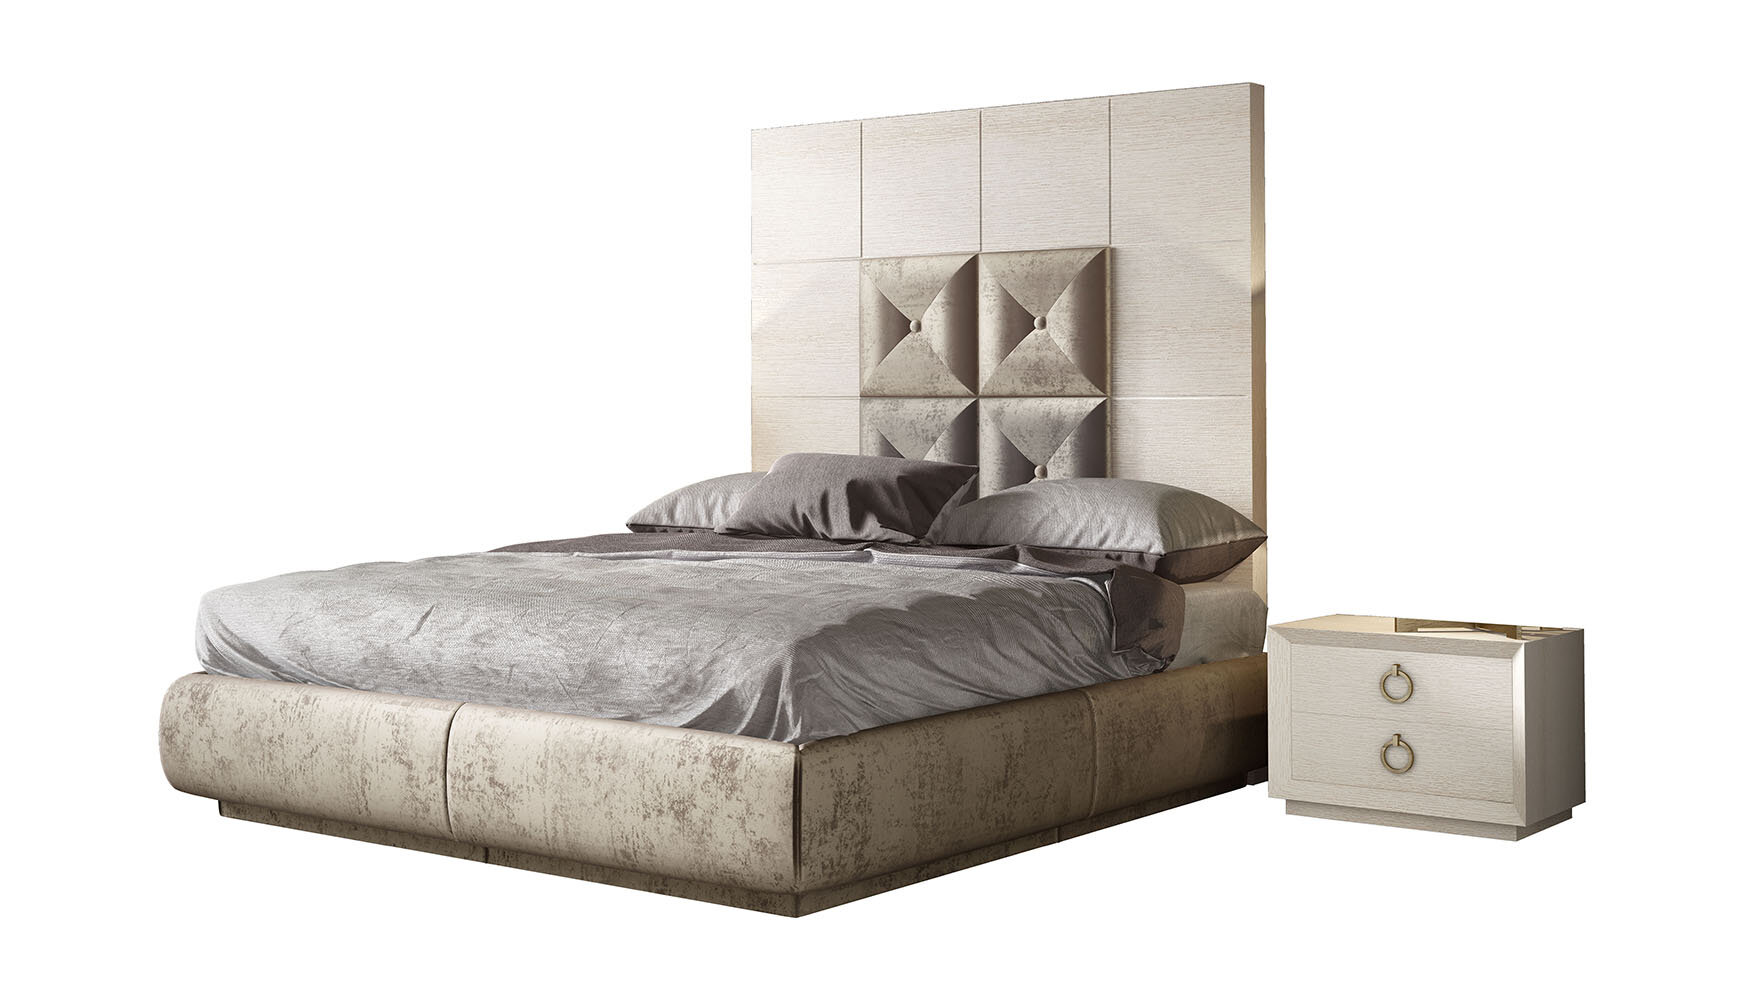 Hispania Home London Bedor73 Bedroom Set 3 Pieces Wayfair